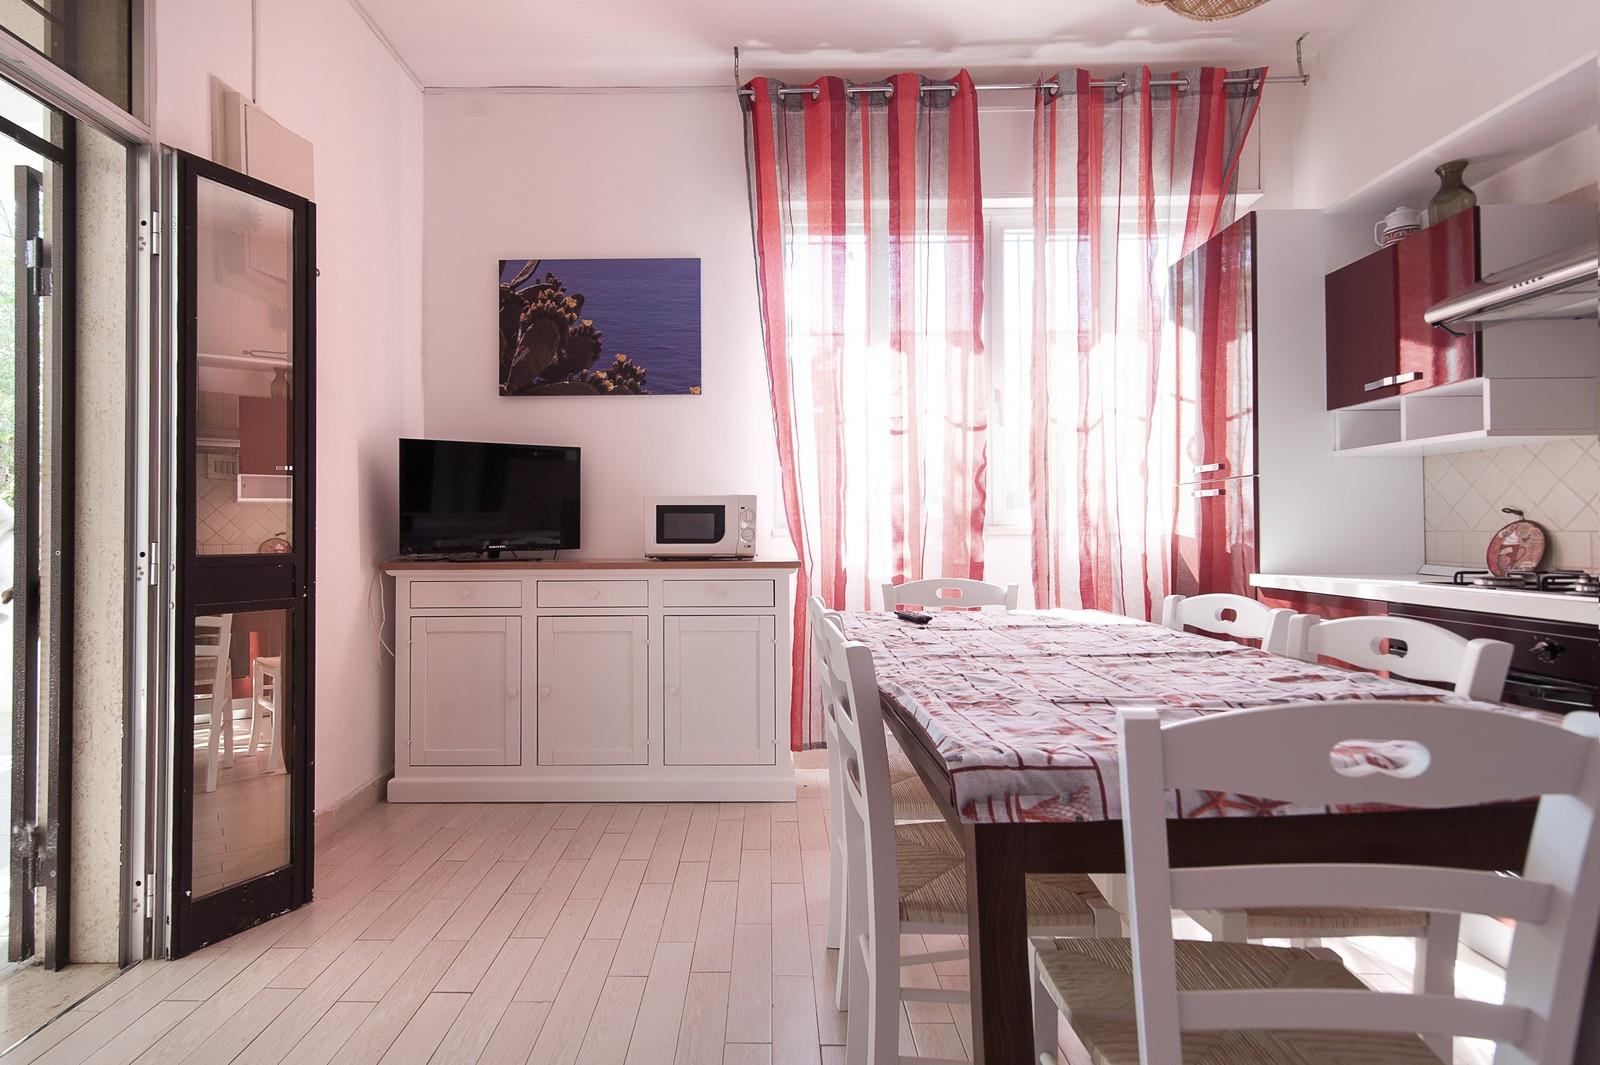 Ferienhaus Villa Mariposa  n. 2-150 meters from the beach (2354066), Porto Cesareo, Lecce, Apulien, Italien, Bild 4